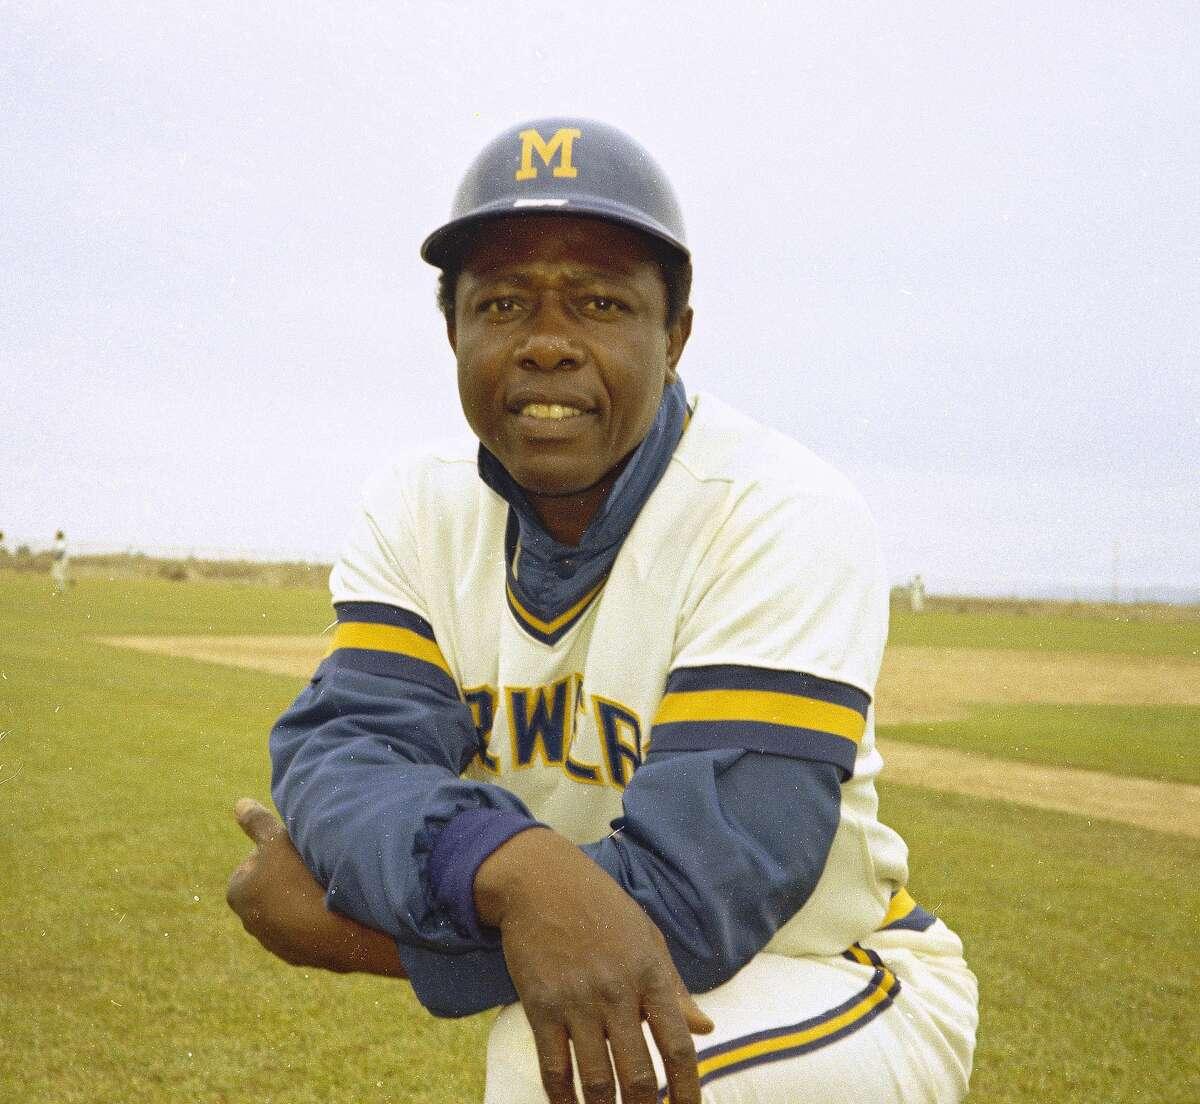 Milwaukee Brewers' outfielder Hank Aaron is seen in 1975. (AP Photo)